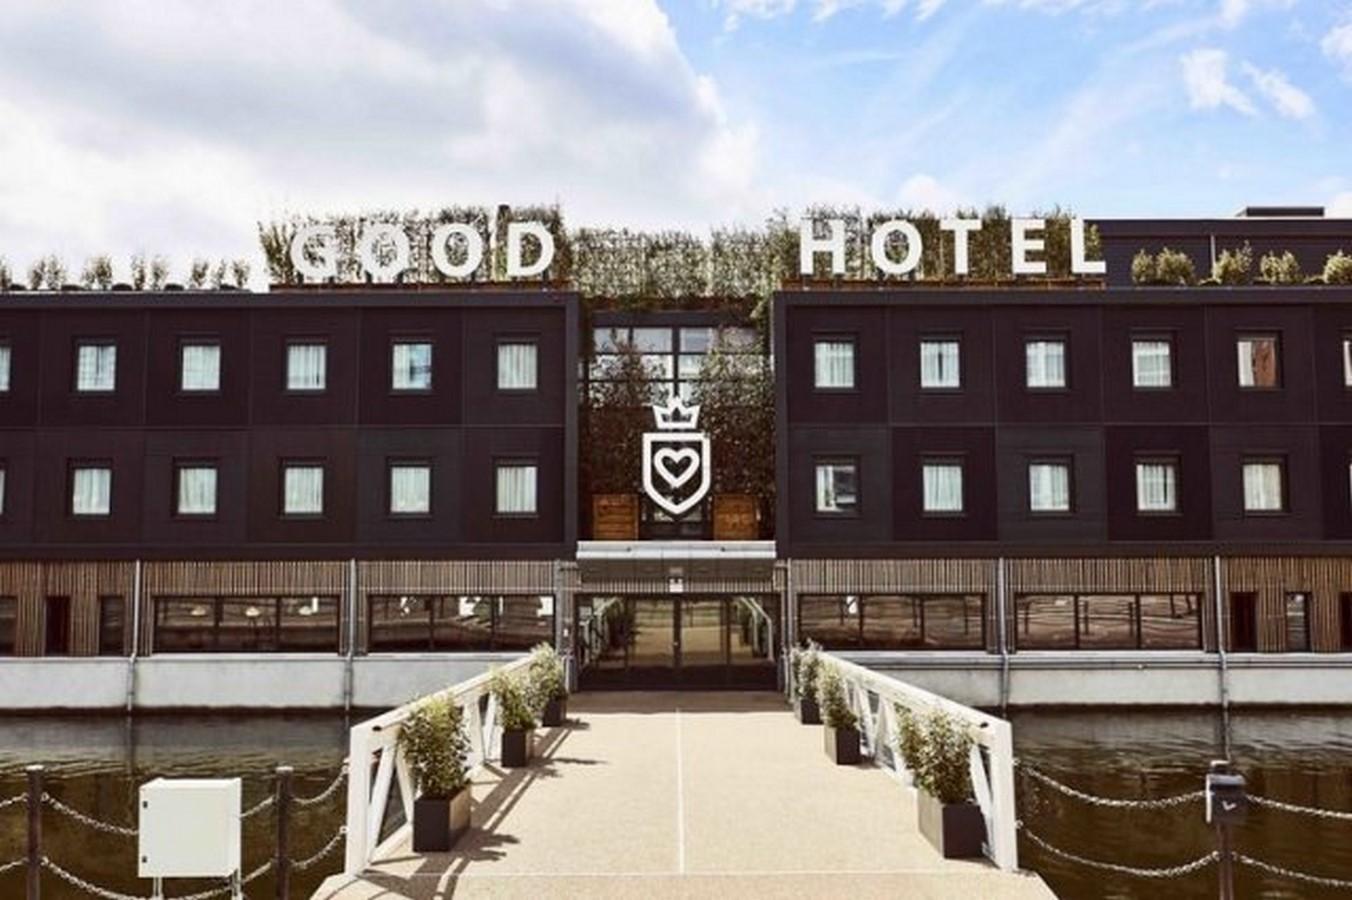 THE GOOD HOTEL - Sheet1